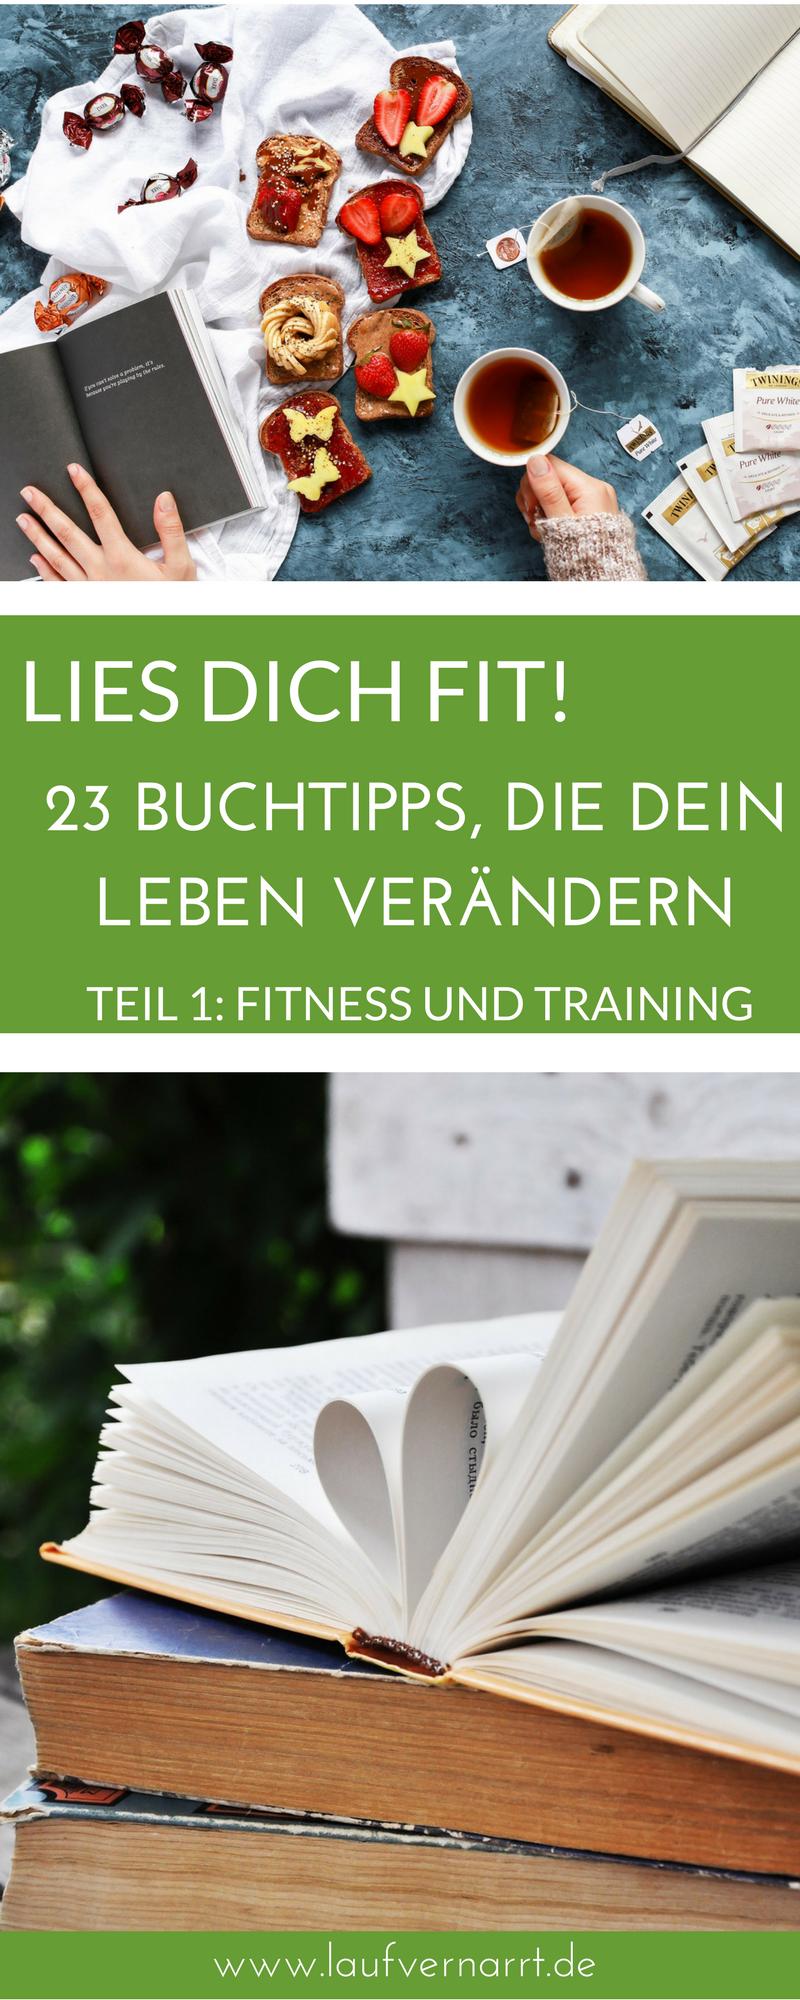 #krafttraining #wichtigsten #buchtipps #training #verndern #mentales #ernhrung #erhltst #fitness #er...